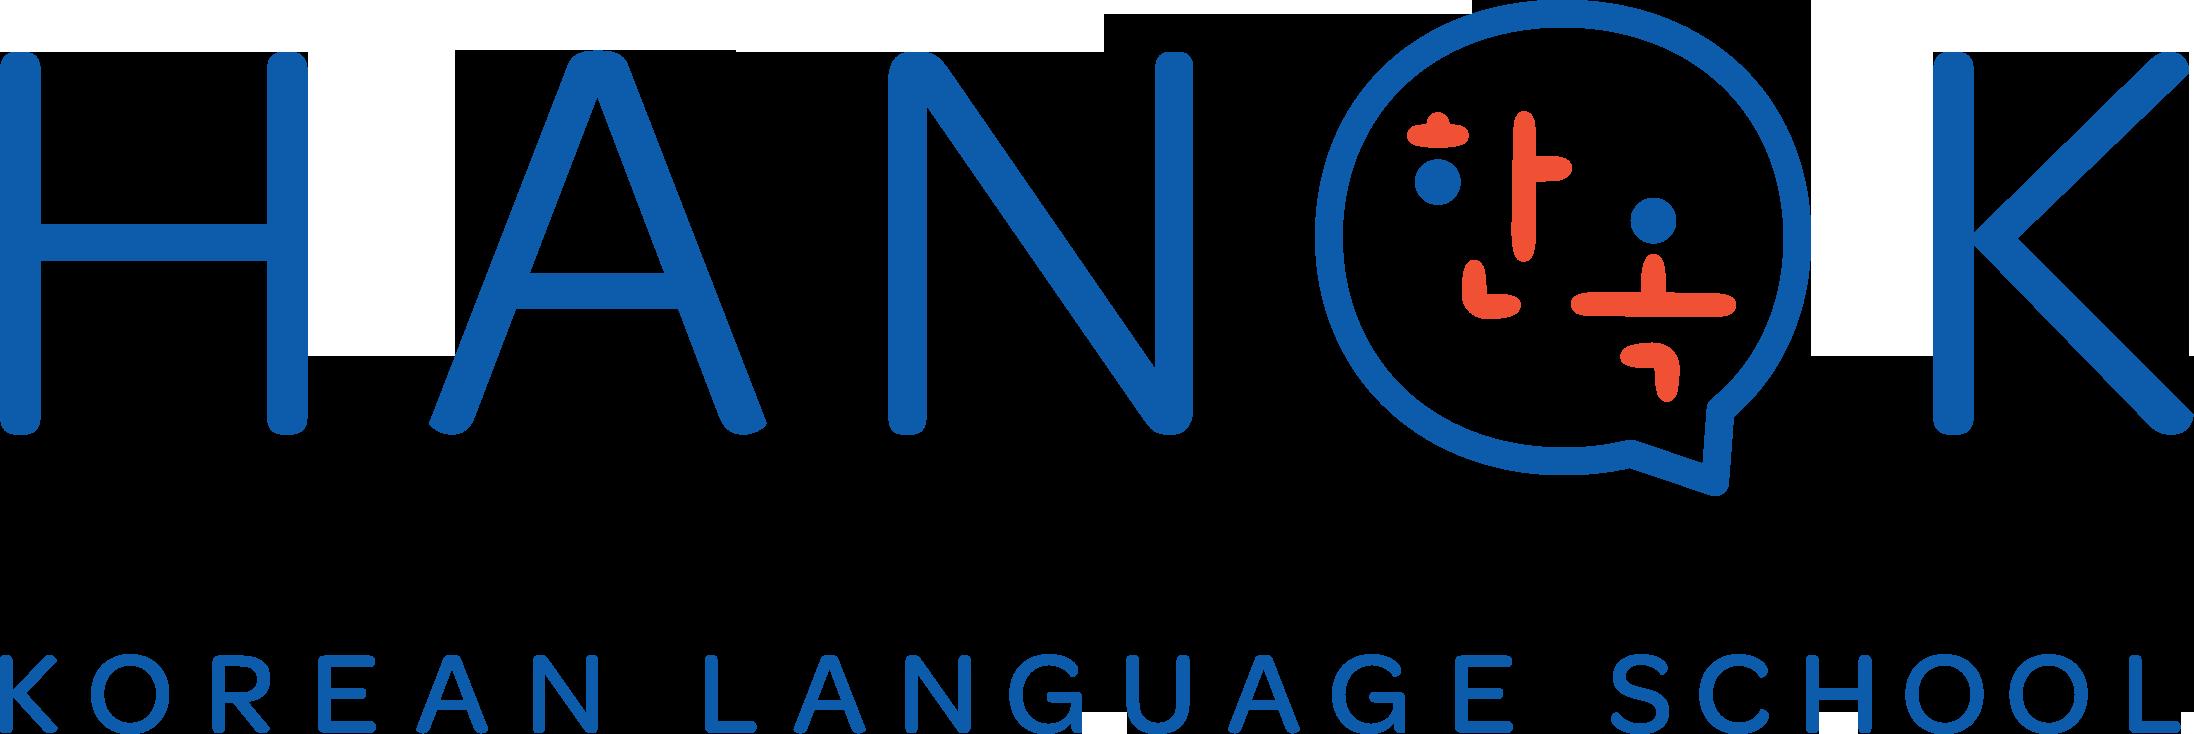 HANOK INTERMEDIATE 3 Qualification Test